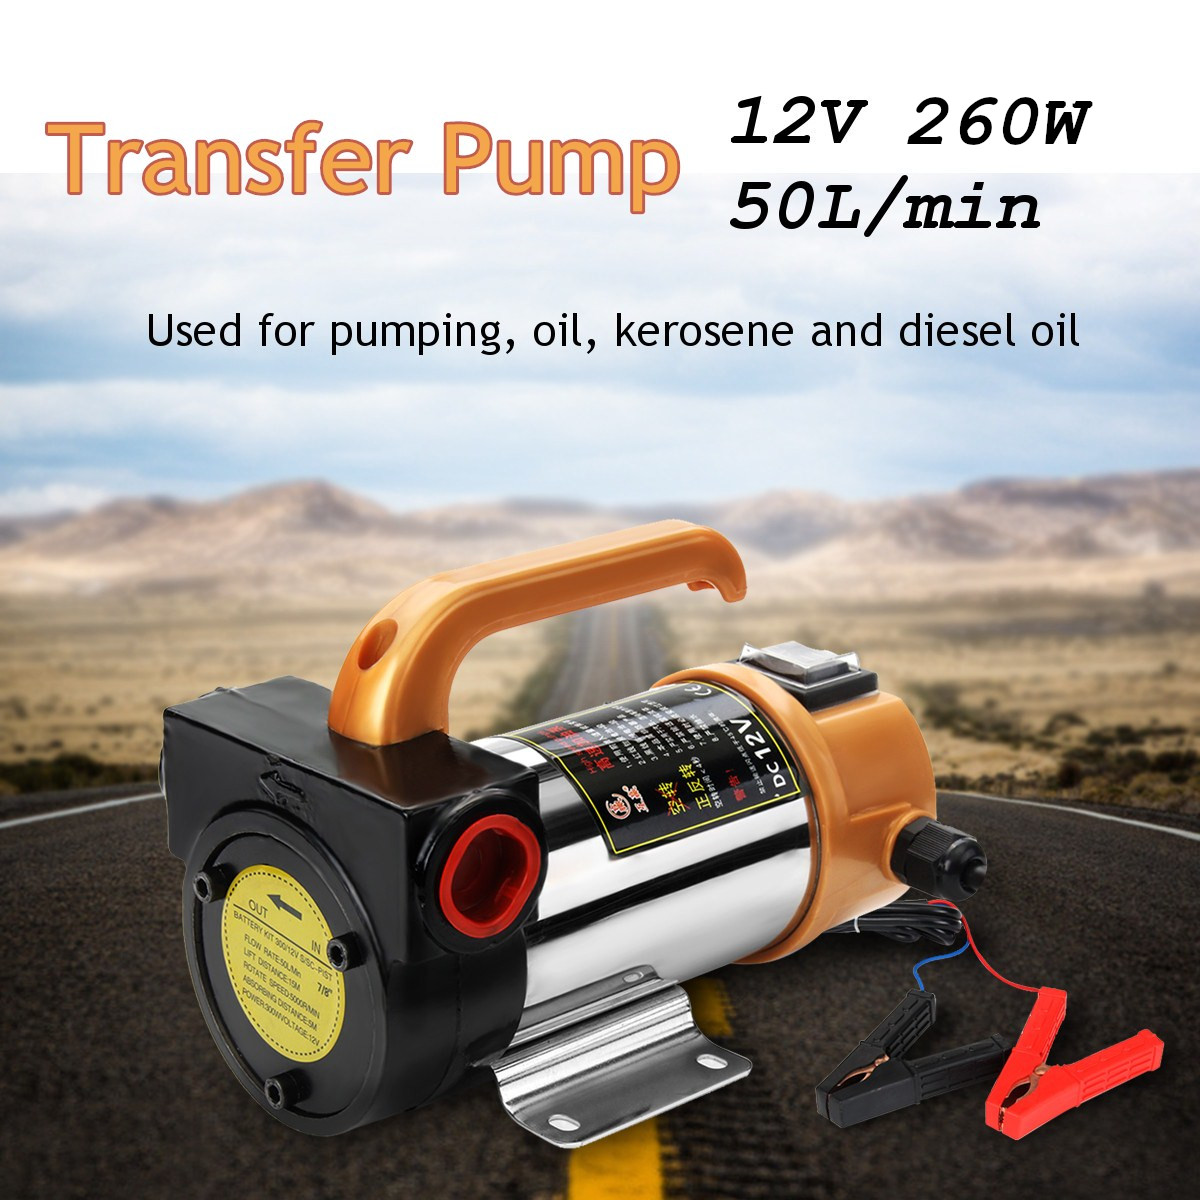 Motor de coche portátil 12V 260W para bomba de transferencia de aceite de combustible Diesel bomba de aceite autocebante 50 l/Min